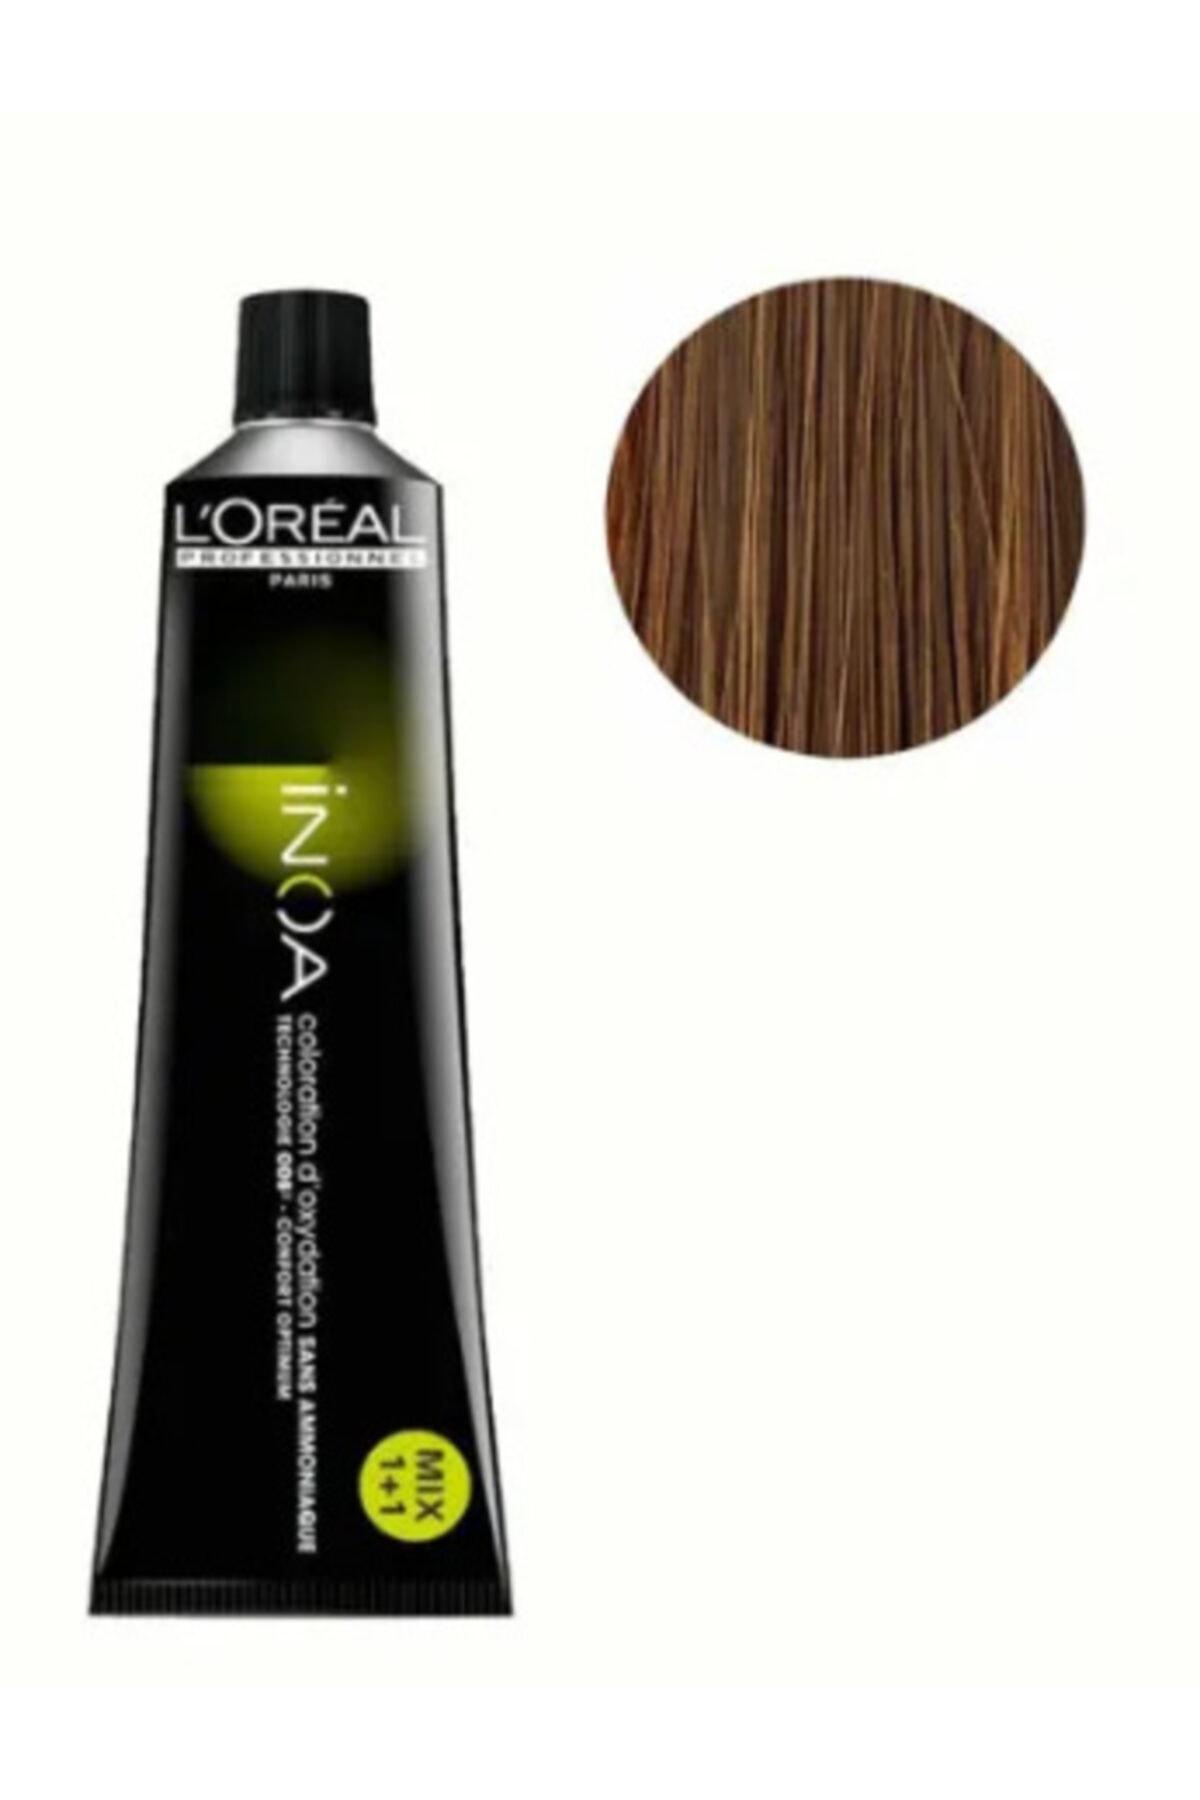 L'oreal Professionnel L'oreal Professional Inoa Saç Boyası 8,0 Renk Yoğun Koyu Sarı 1